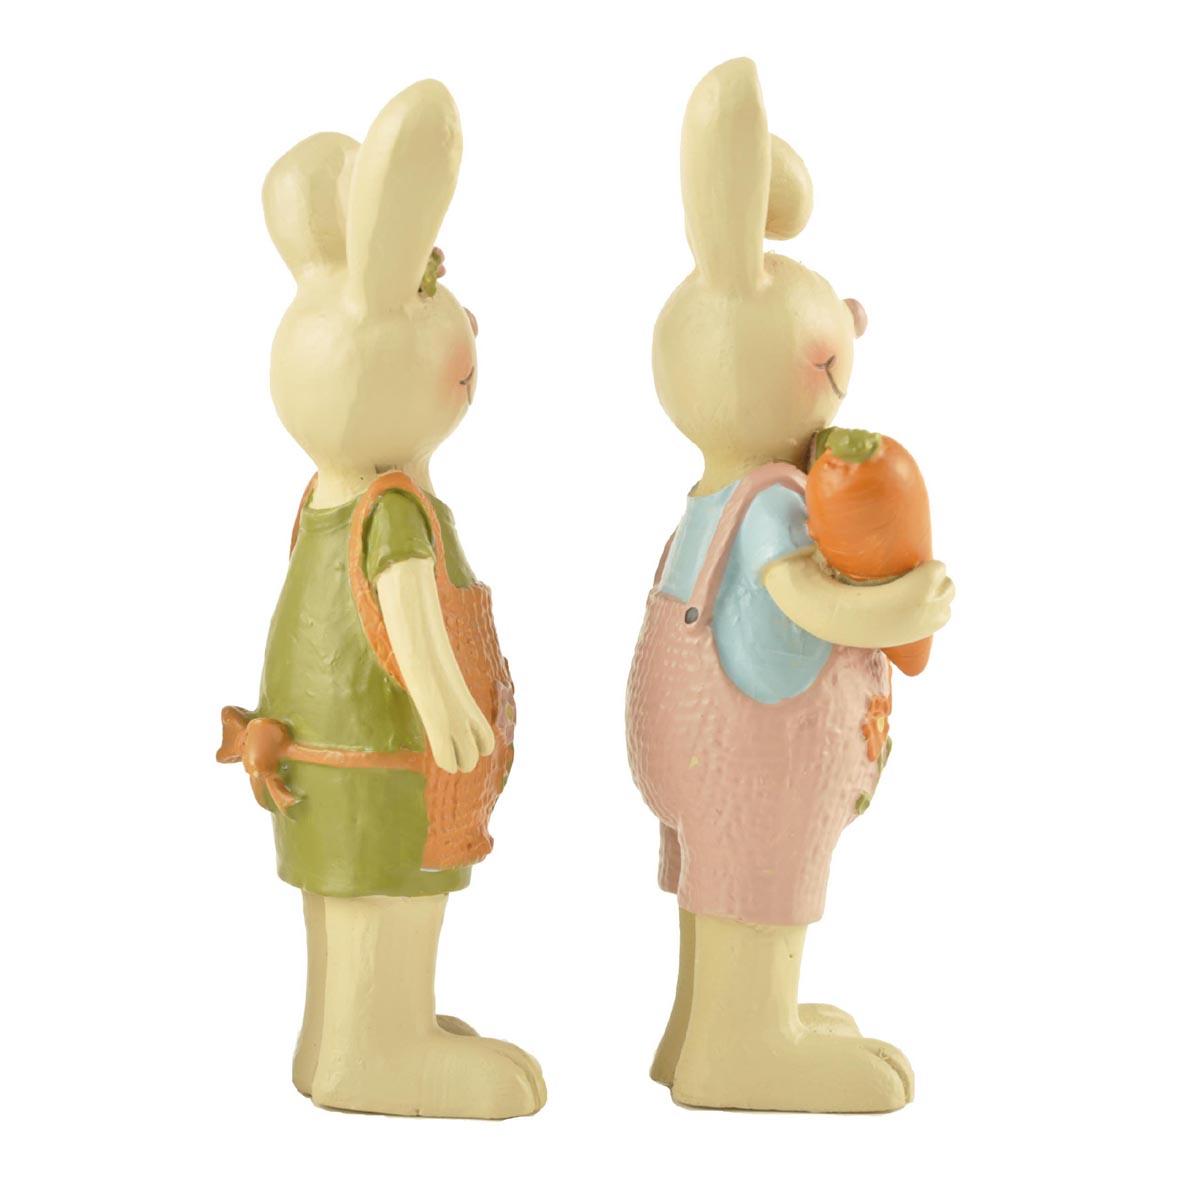 Ennas easter rabbit decor top brand for holiday gift-1